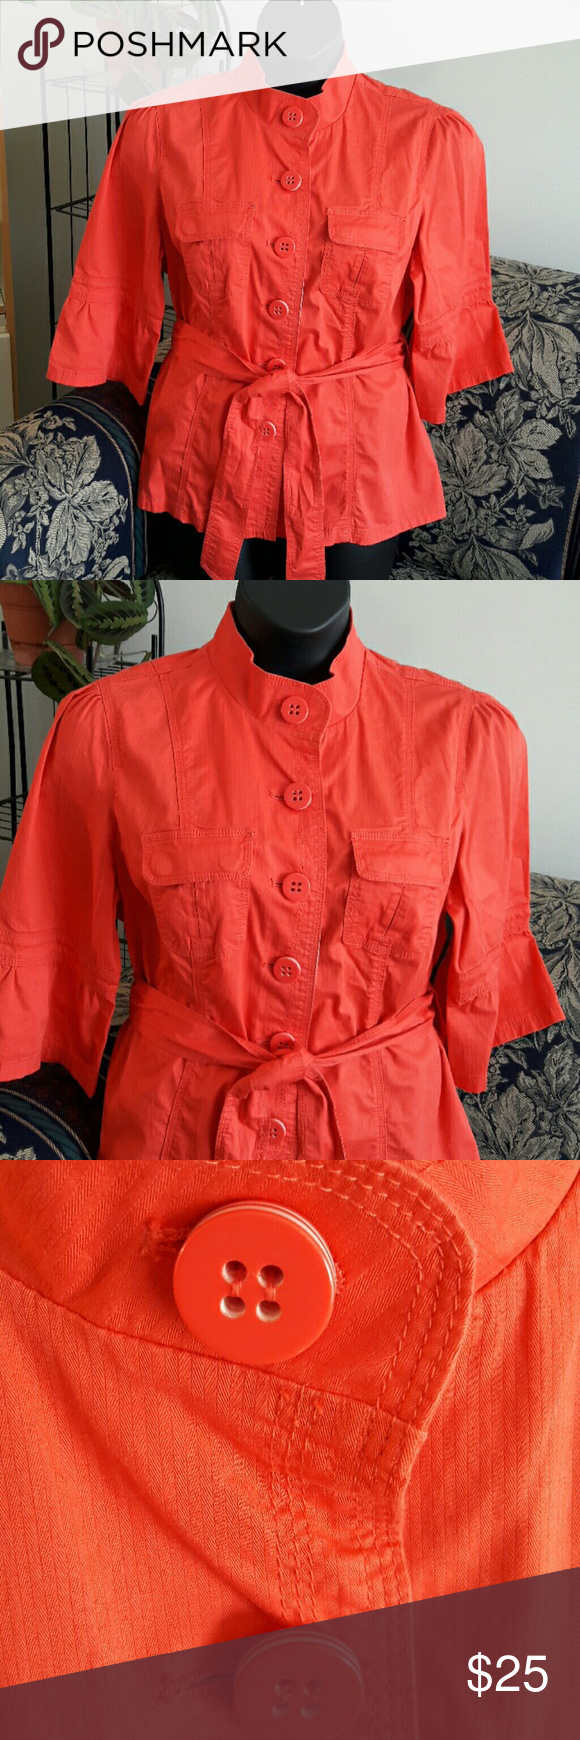 🍊LANE BRYANT BELL SLEEVE JACKET NWOT,  pumpkin colored jacket w/waist tie belt (color in photo is darker than actual garment). Lane Bryant Jackets & Coats